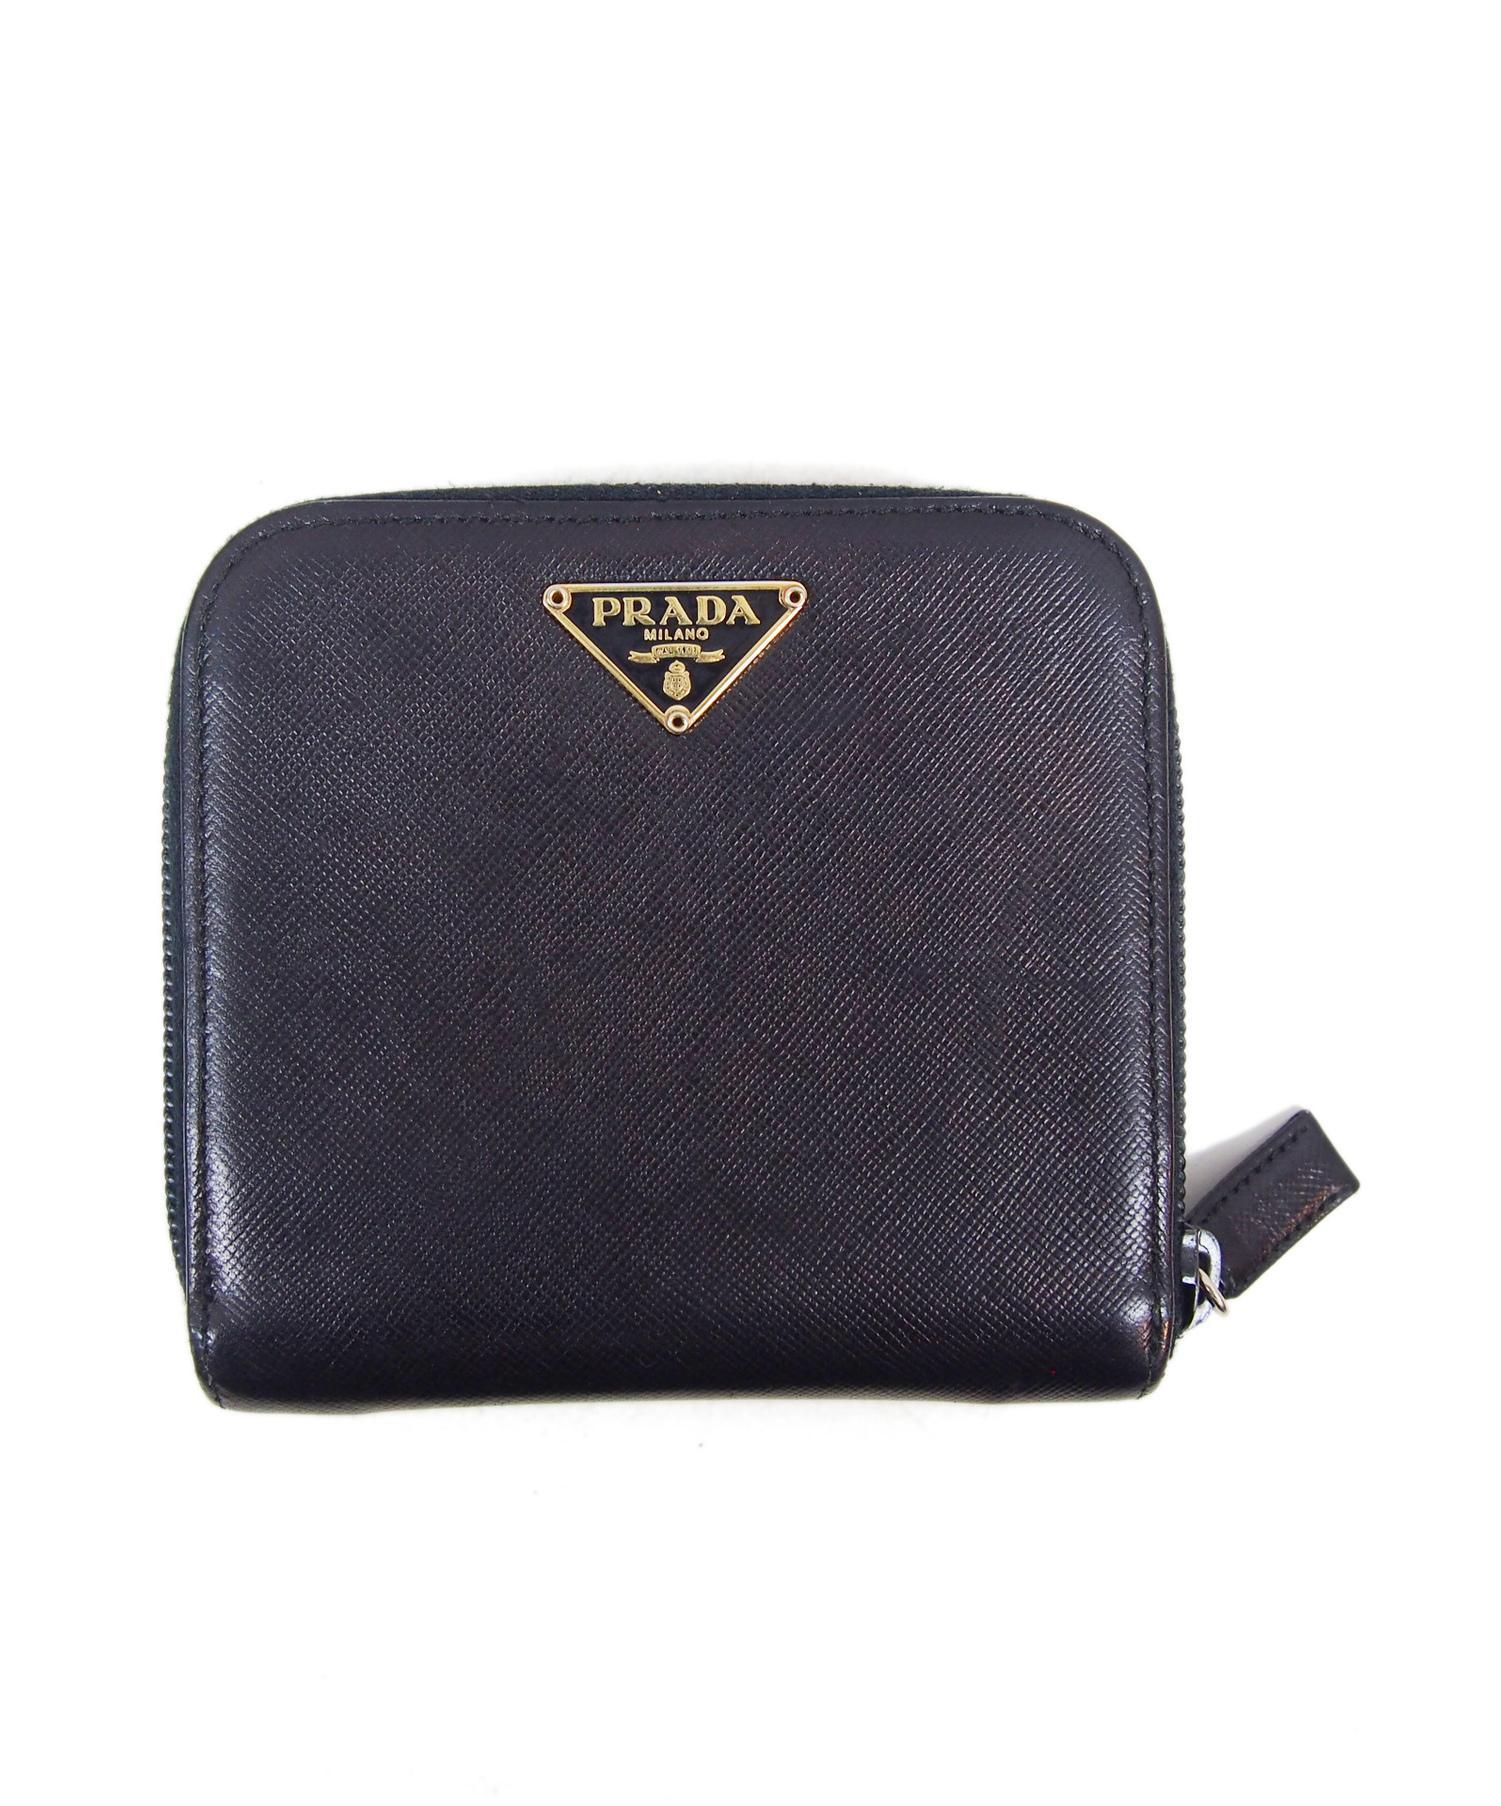 wholesale dealer 26a79 53e1d [中古]PRADA(プラダ)のレディース 服飾小物 ラウンドジップ2つ折り財布